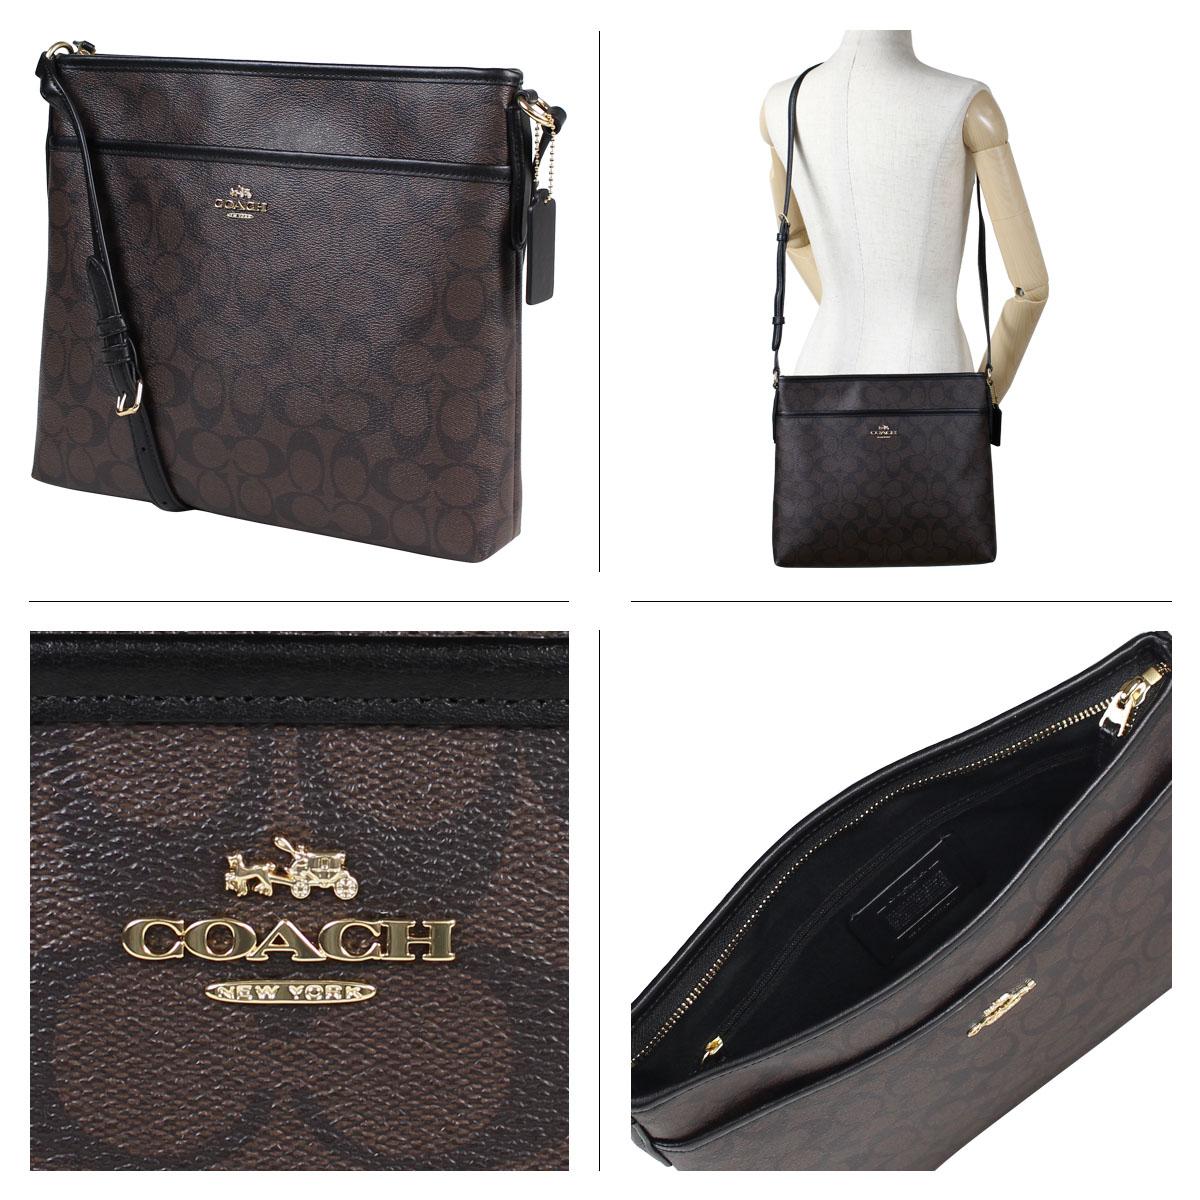 Coach File Bag In Signature Shoulder Lady S F59297 Brown 11 13 Shinnyu Load 1711